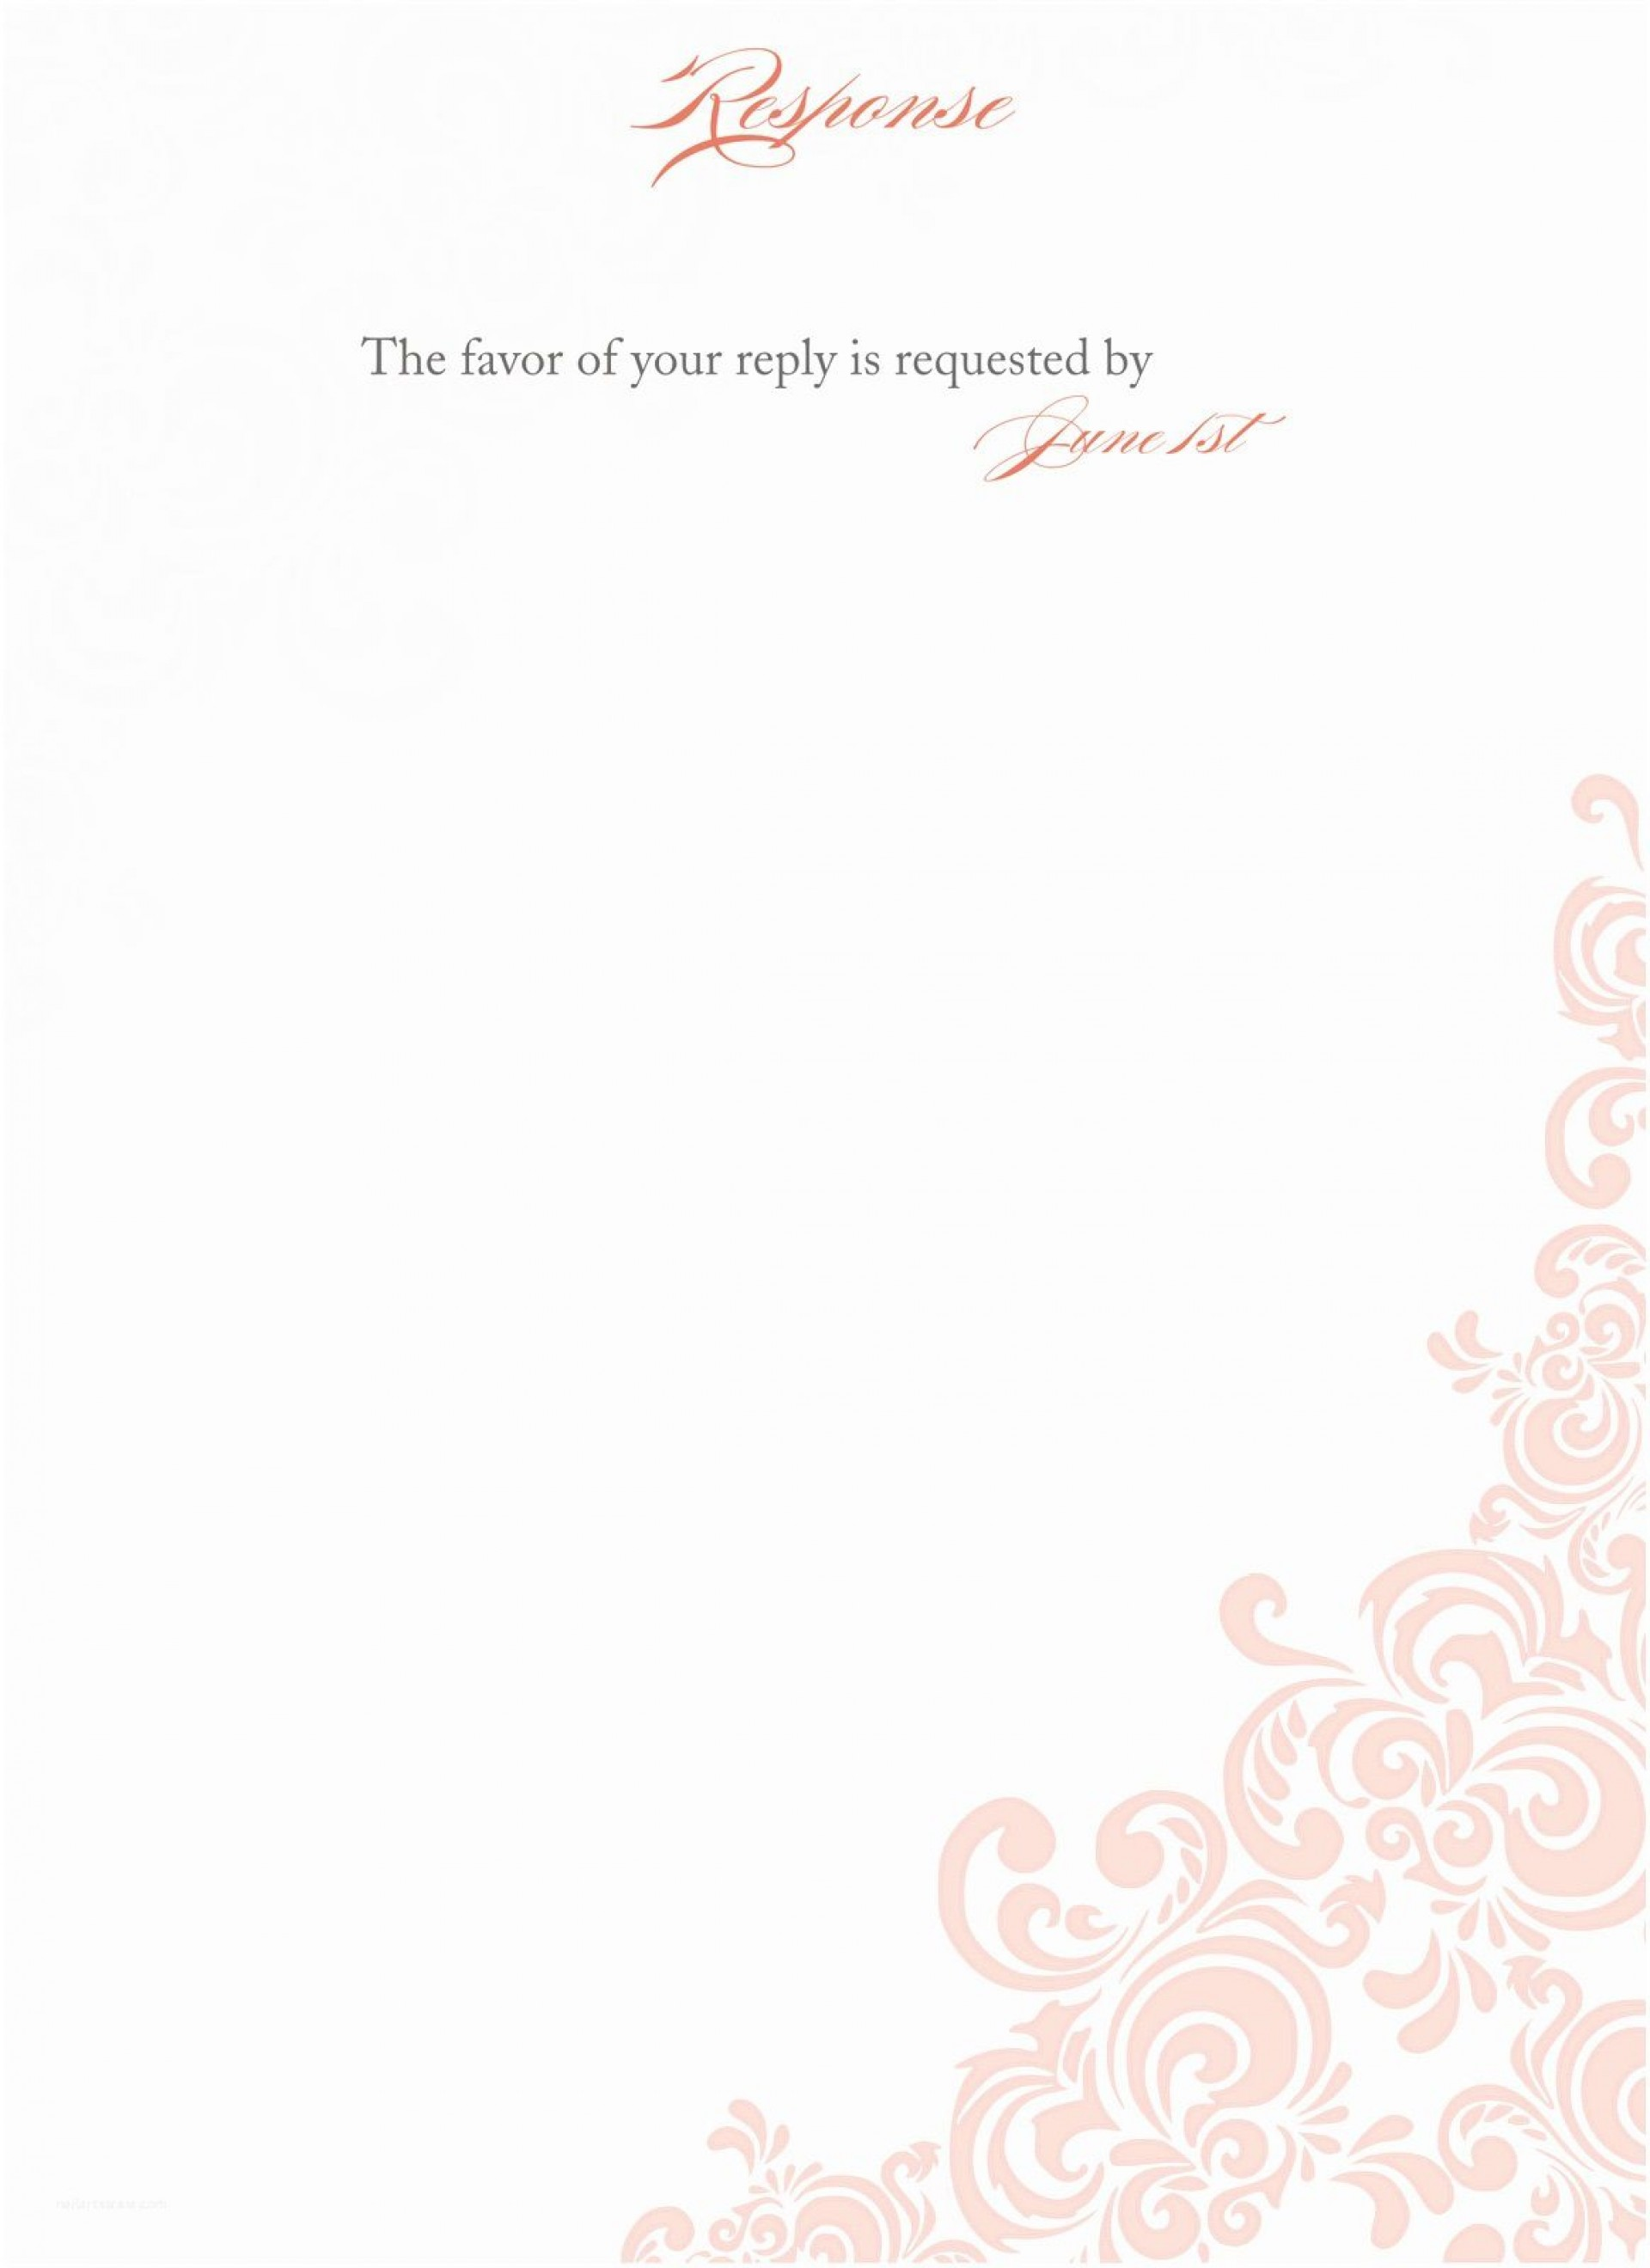 006 Wonderful Blank Wedding Invitation Template Idea  Templates Free Download Printable Royal Blue1920